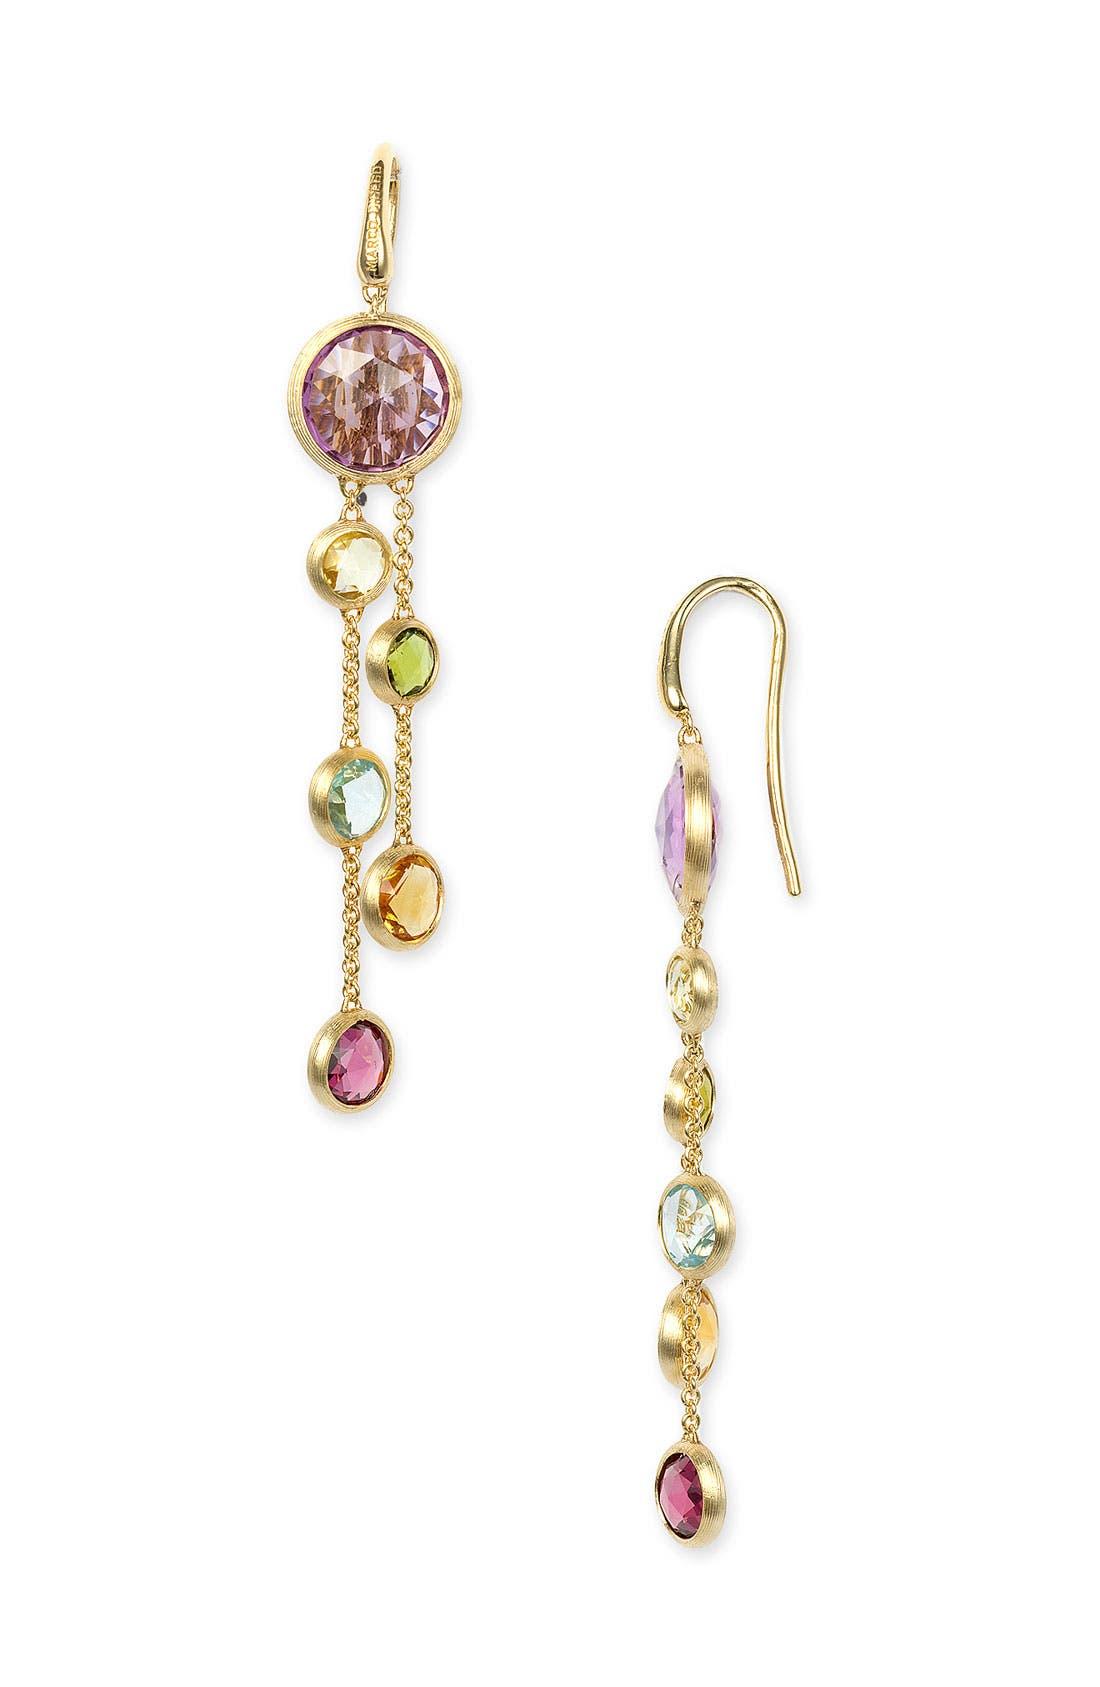 Alternate Image 1 Selected - Marco Bicego 'Mini Jaipur' Double Strand Earrings